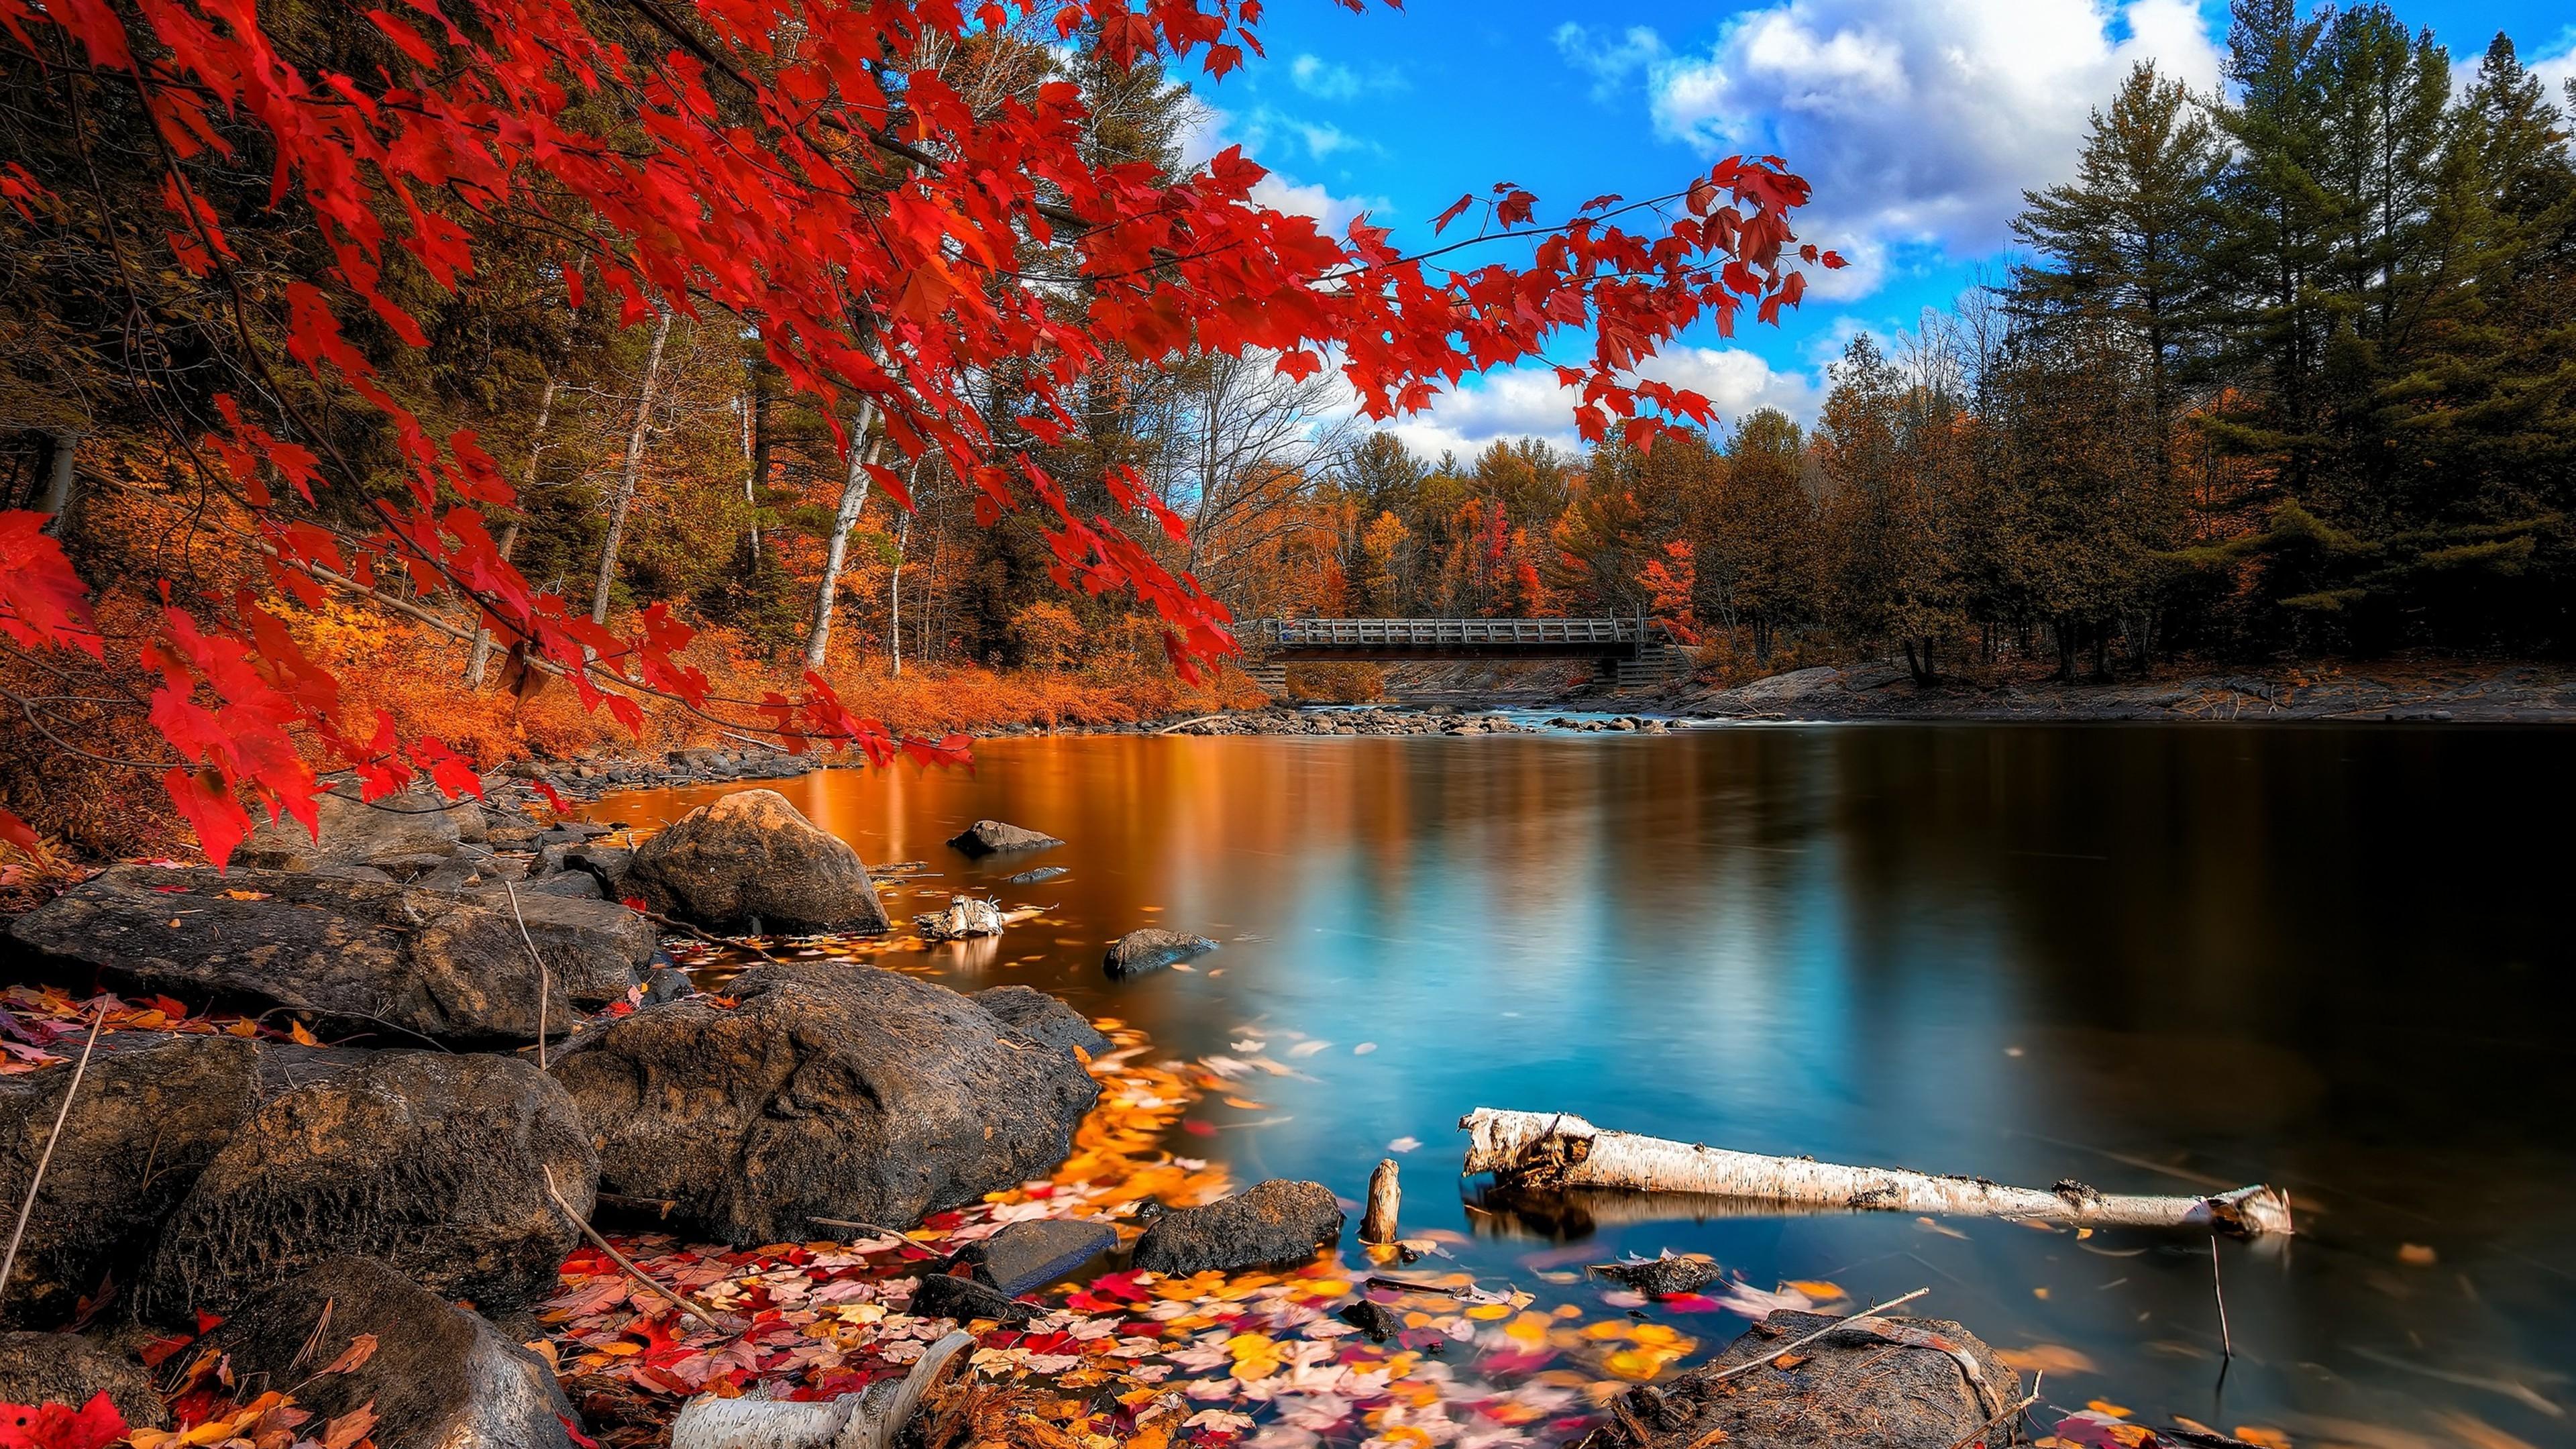 wallpaper.wiki-HD-Fall-Foliage-Picture-PIC-WPE008843